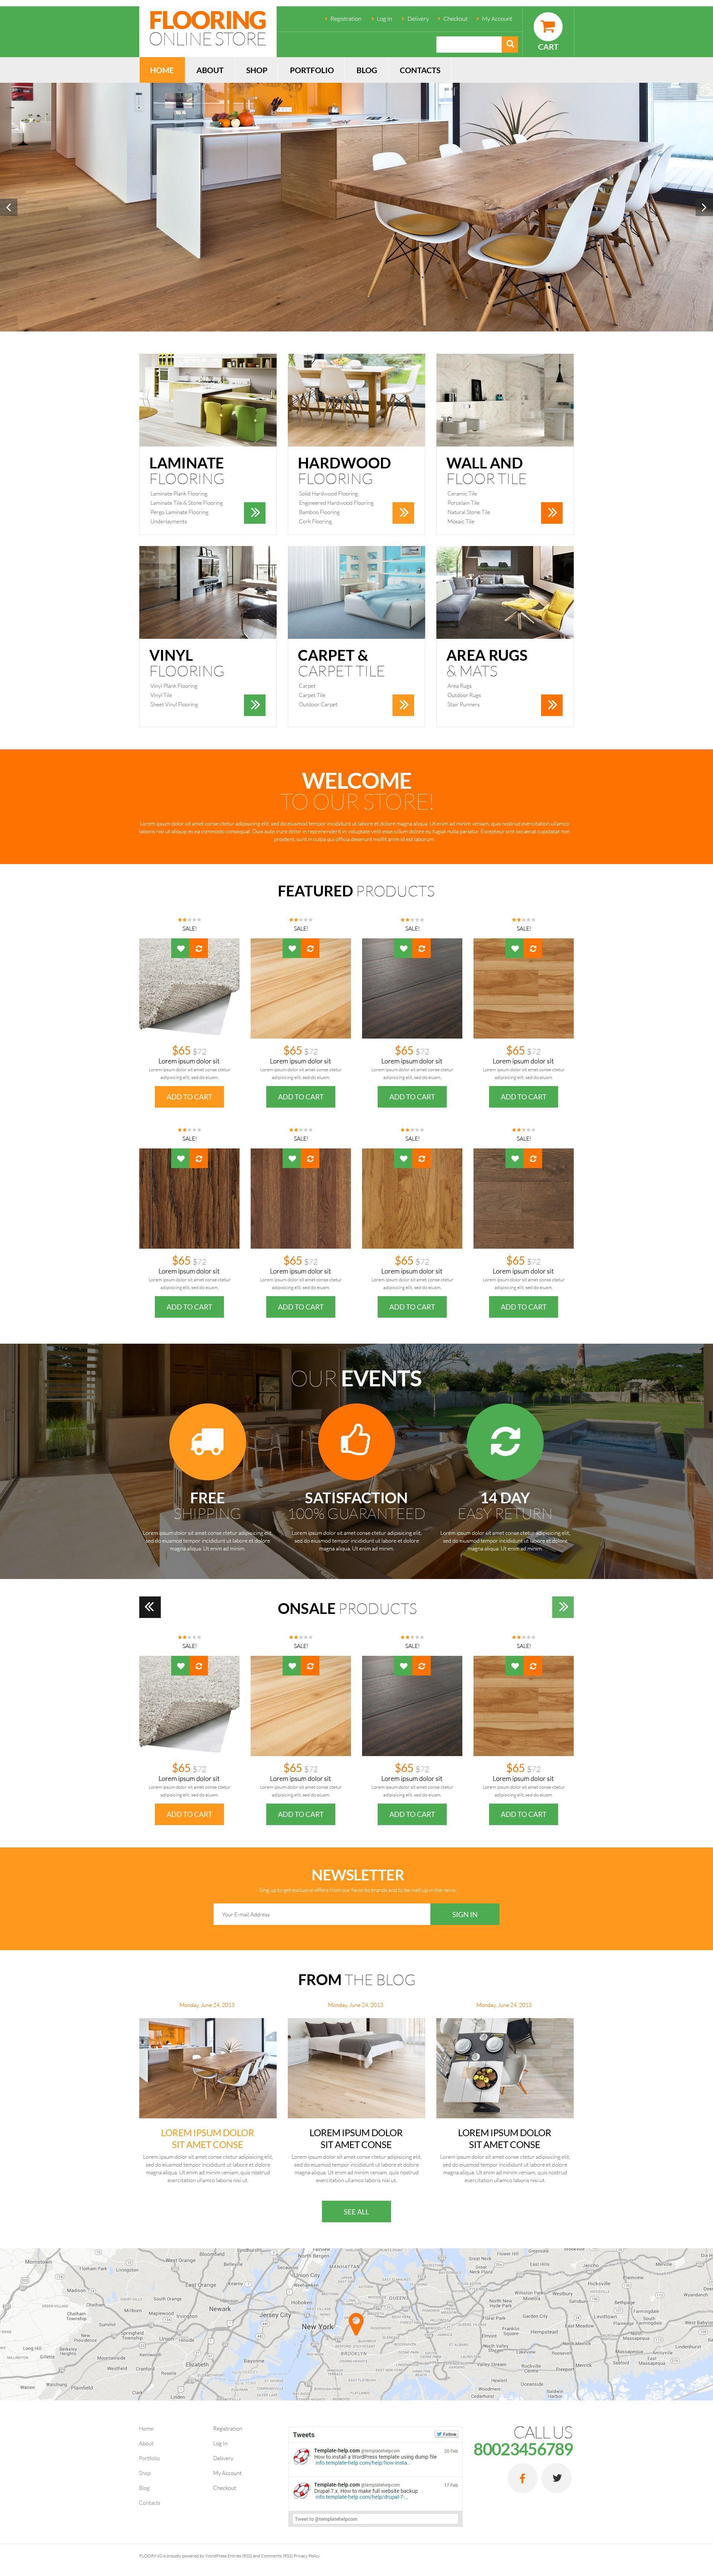 Flooring Services WooCommerce Theme - screenshot